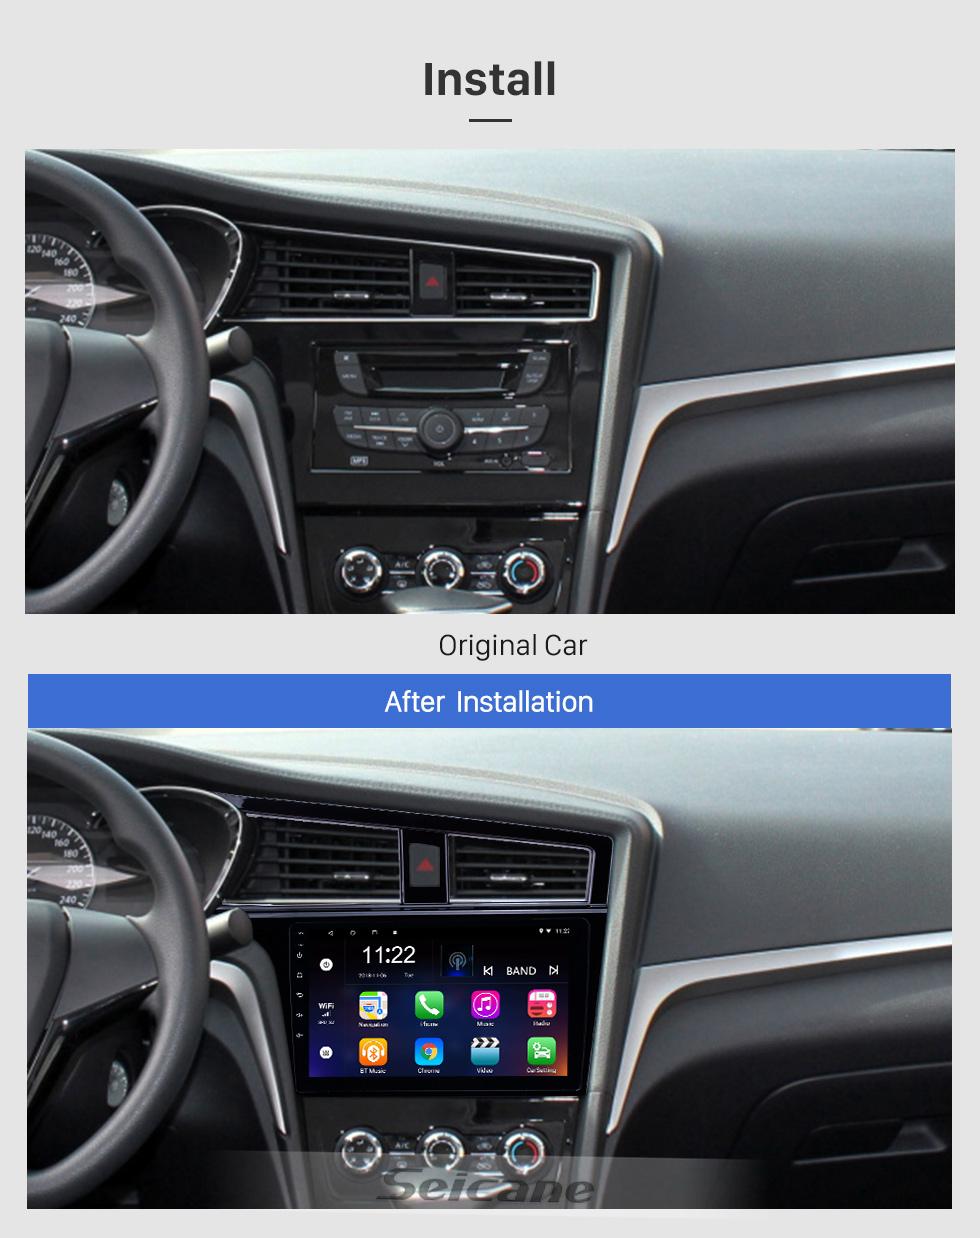 Seicane Android 8.1 9 Zoll HD Touchscreen GPS Navigationsradio für 2017-2019 Venucia D60 mit Bluetooth Unterstützung DVR OBD2 Carplay